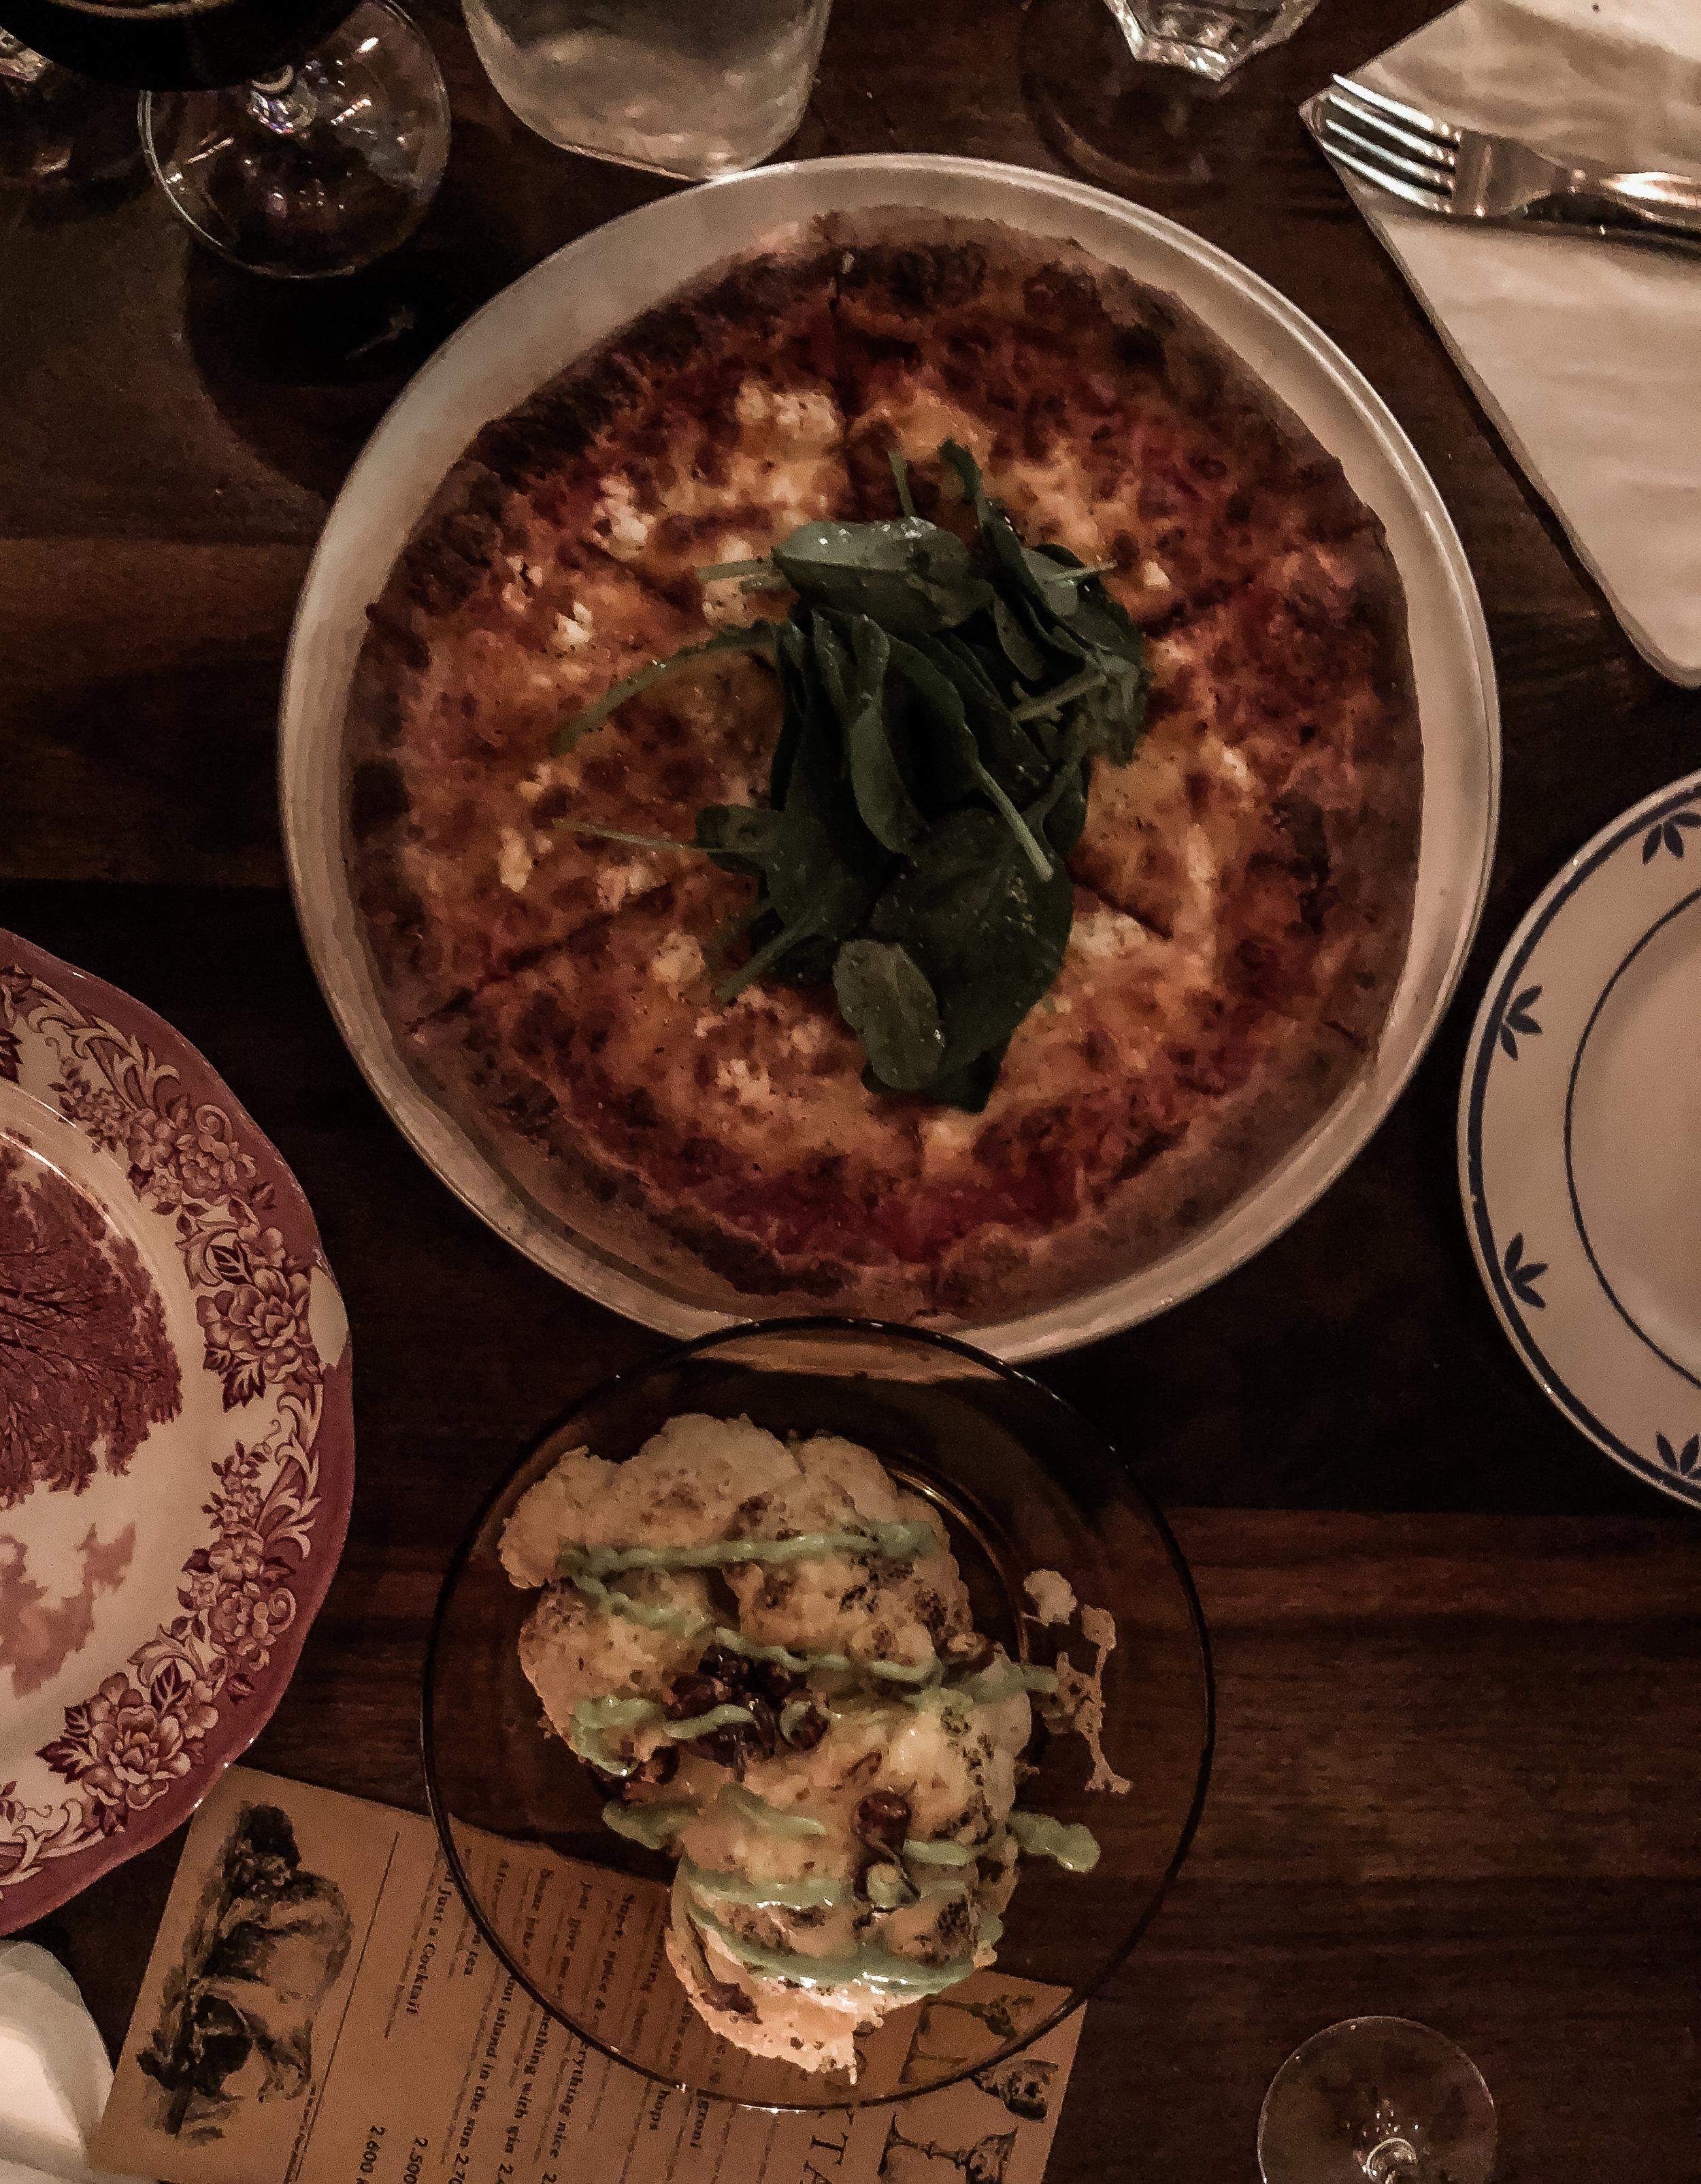 Hverfisgata 12 Pizza in Reykjavik